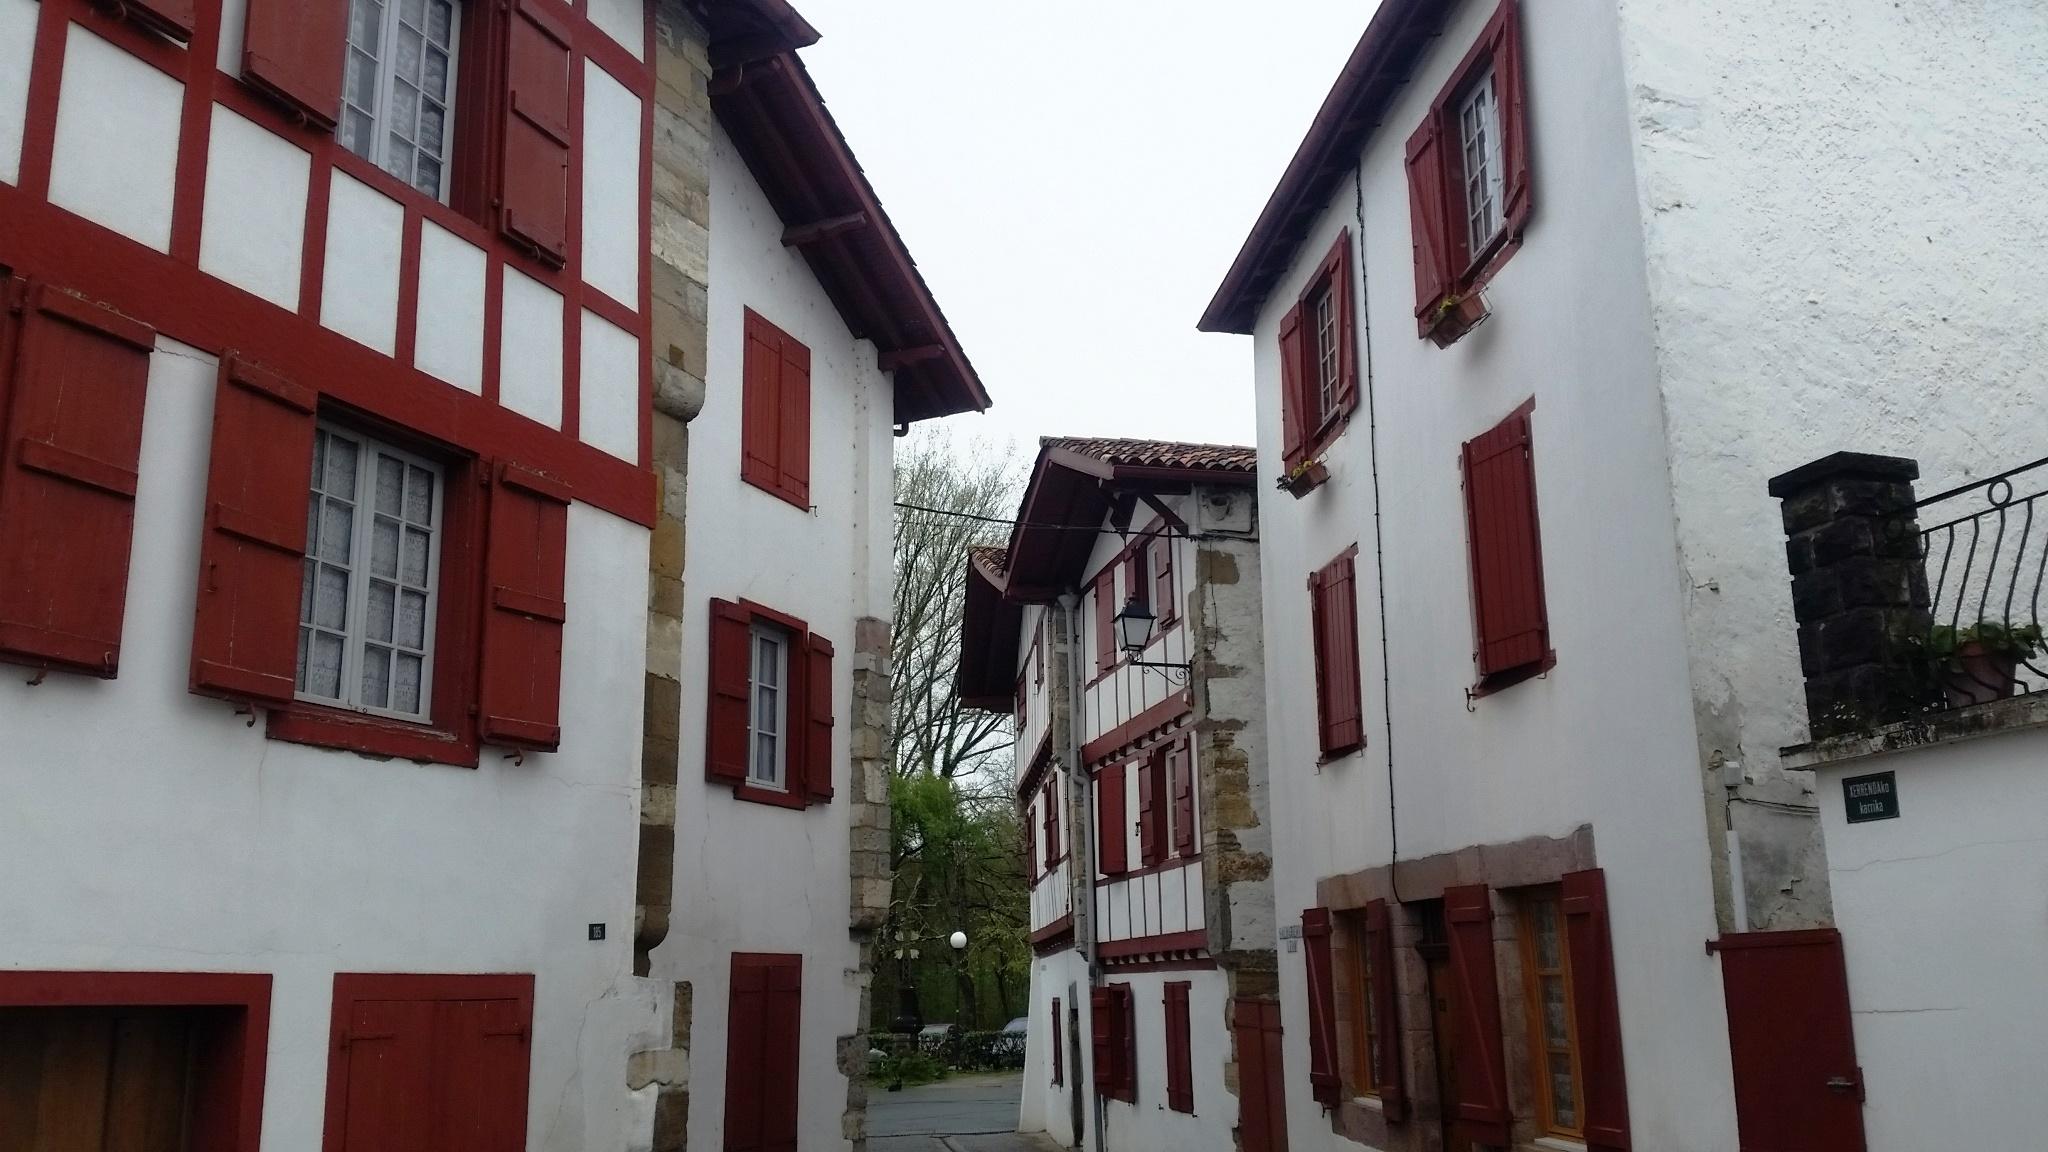 Espelette charming town